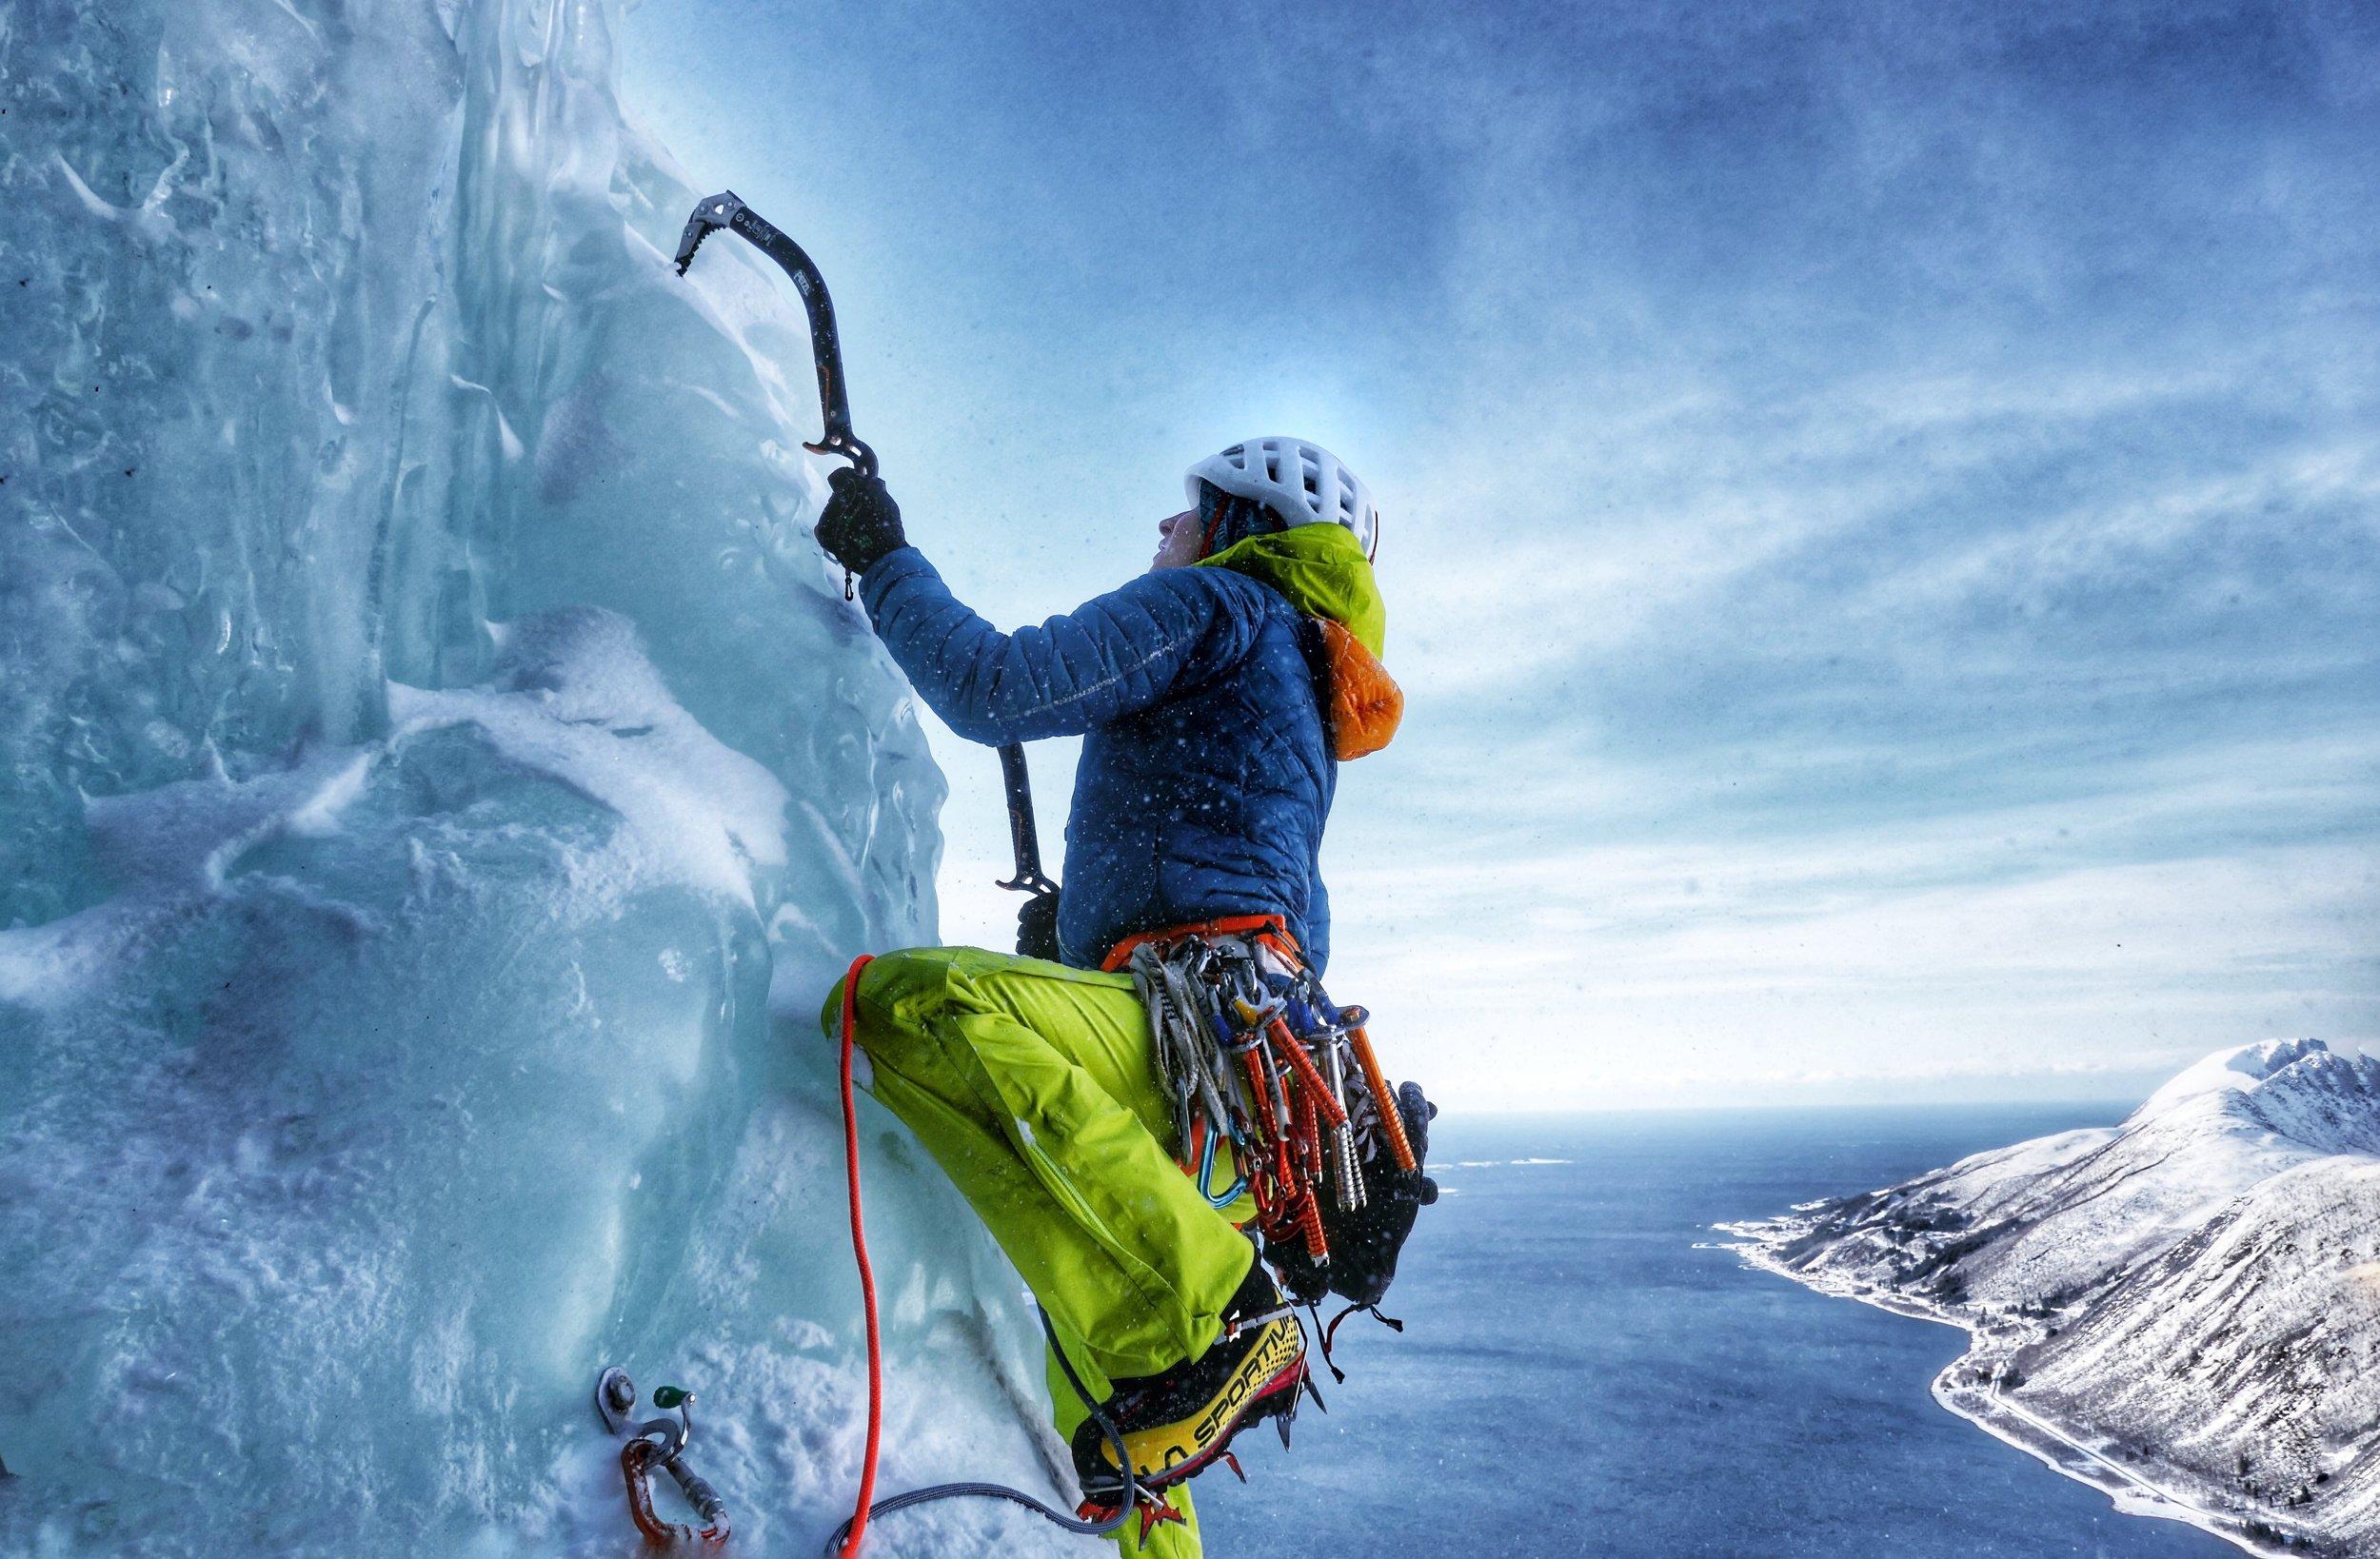 Tanja Schmitt high above the sea during the ascent of 'Finnkona' on Senja Island - picture Matthias Scherer